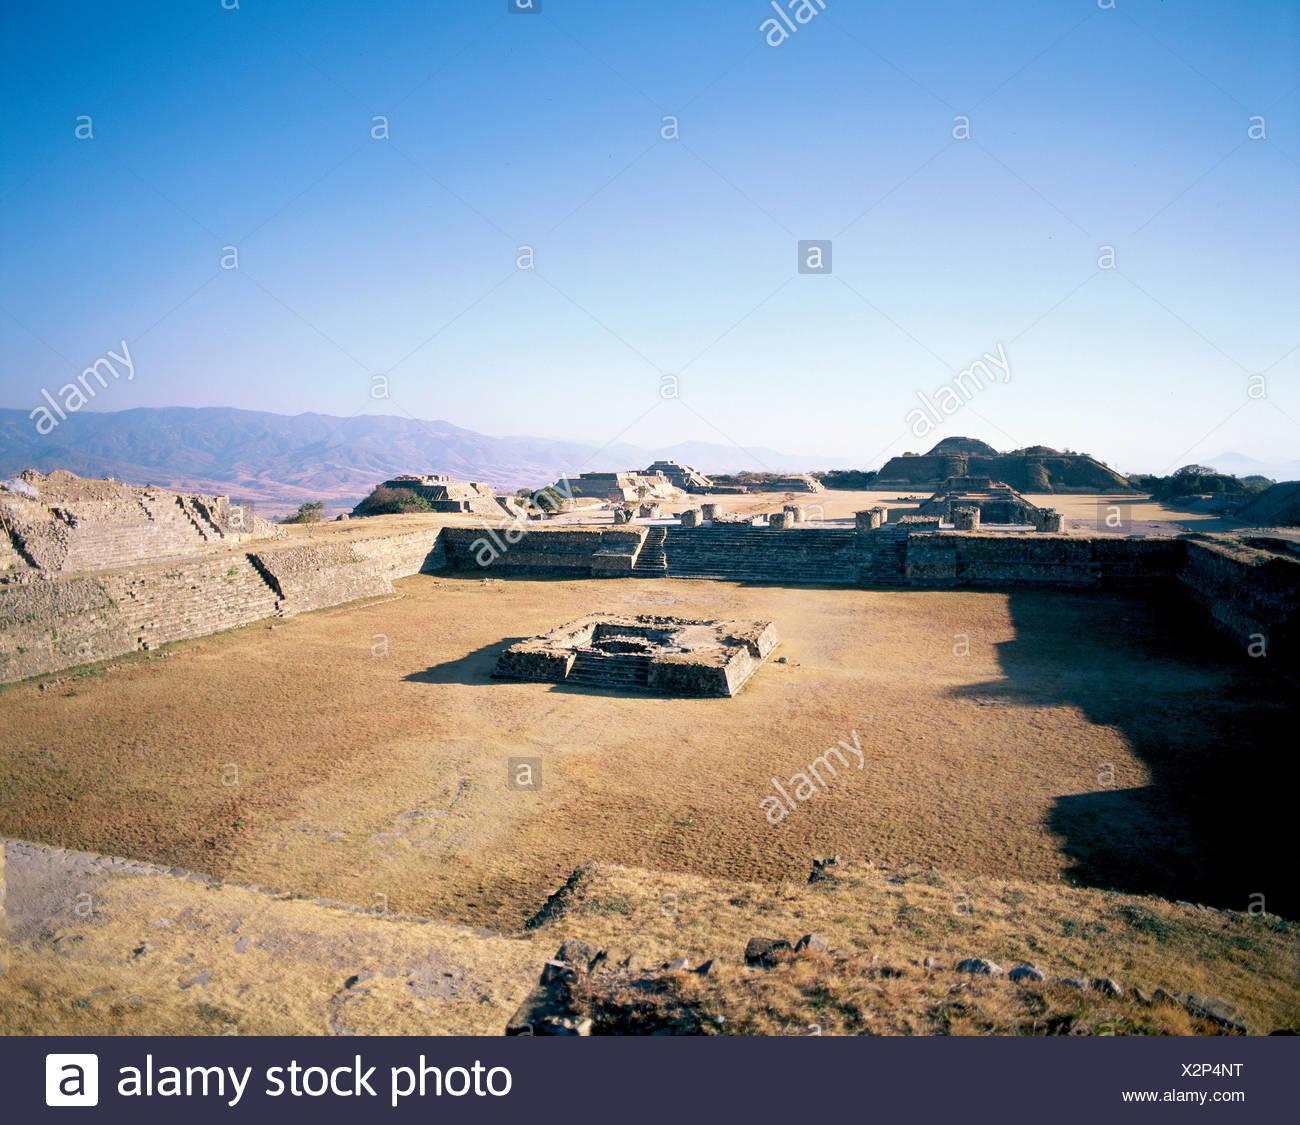 Kultur Mexiko Mittelamerika Lateinamerika Monte Alban Ruinen Süd Plattform Stockbild